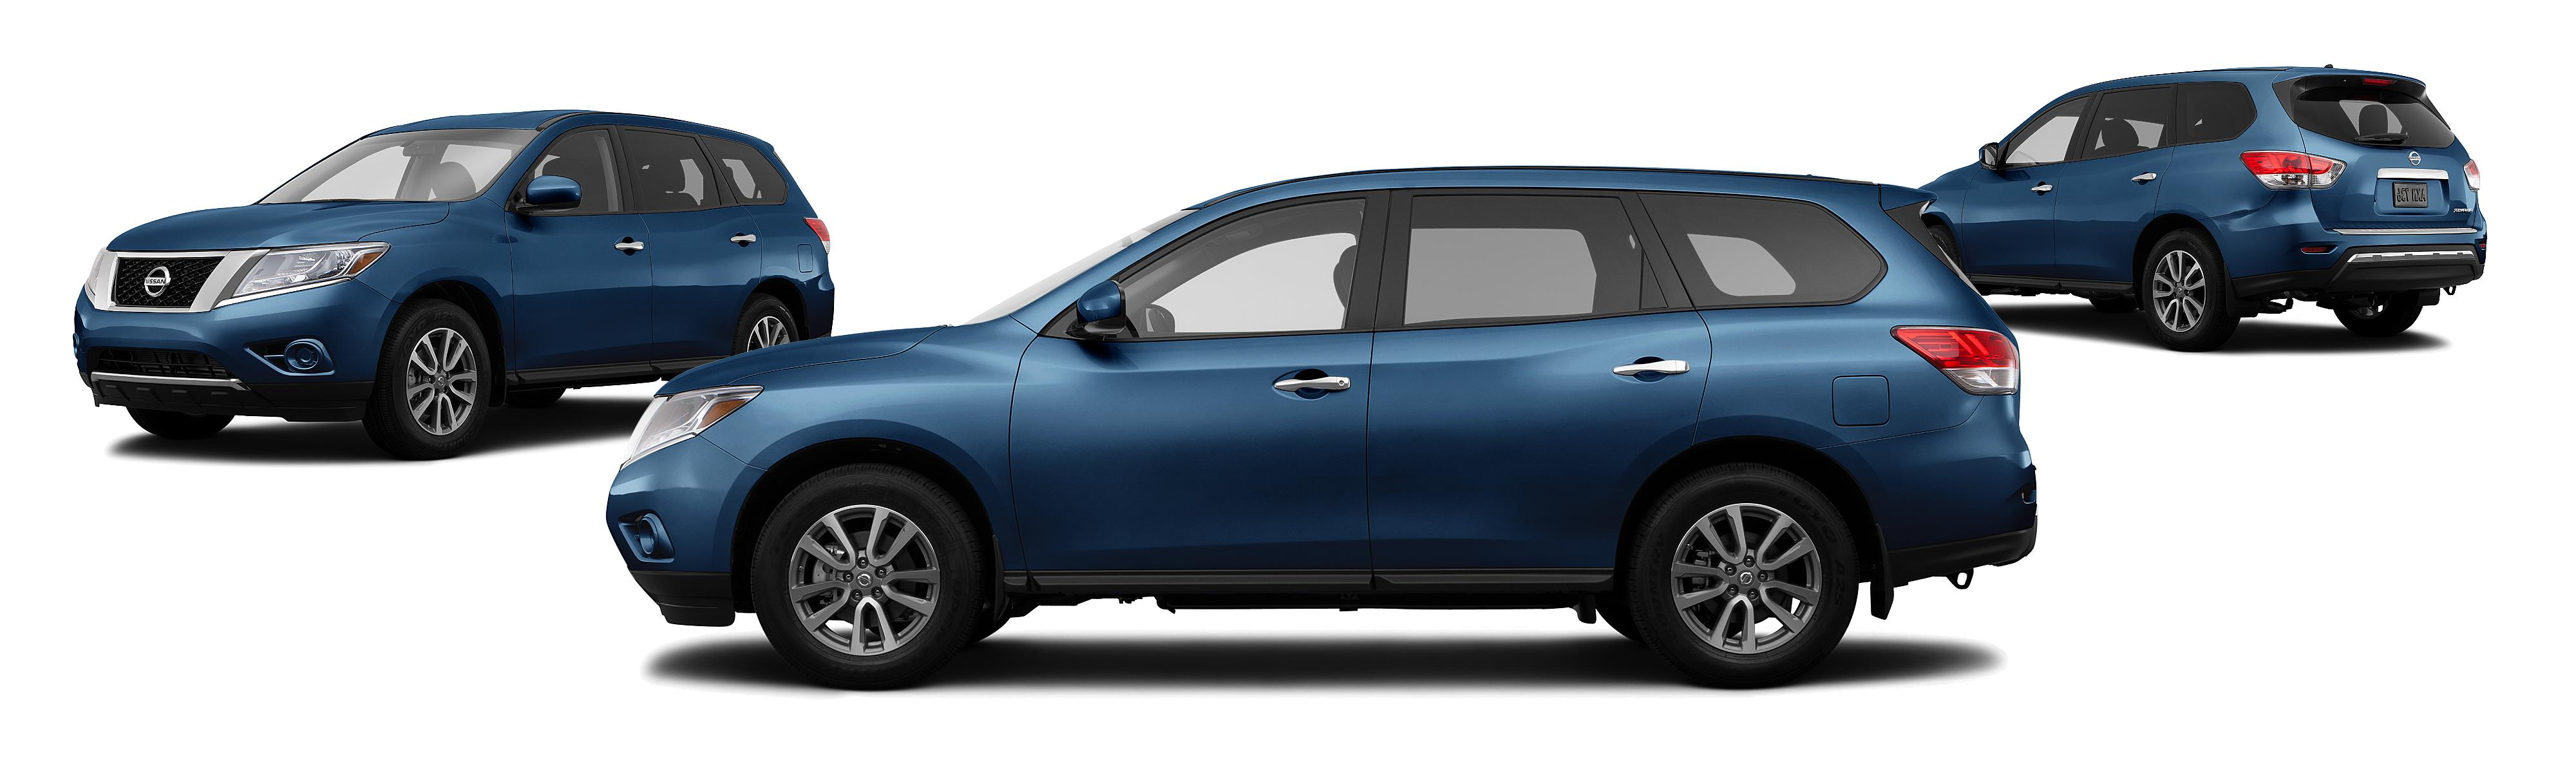 Paul Barnett Nissan 2015 Nissan Pathfinder 4x4 S 4dr Suv Midyear Release Research